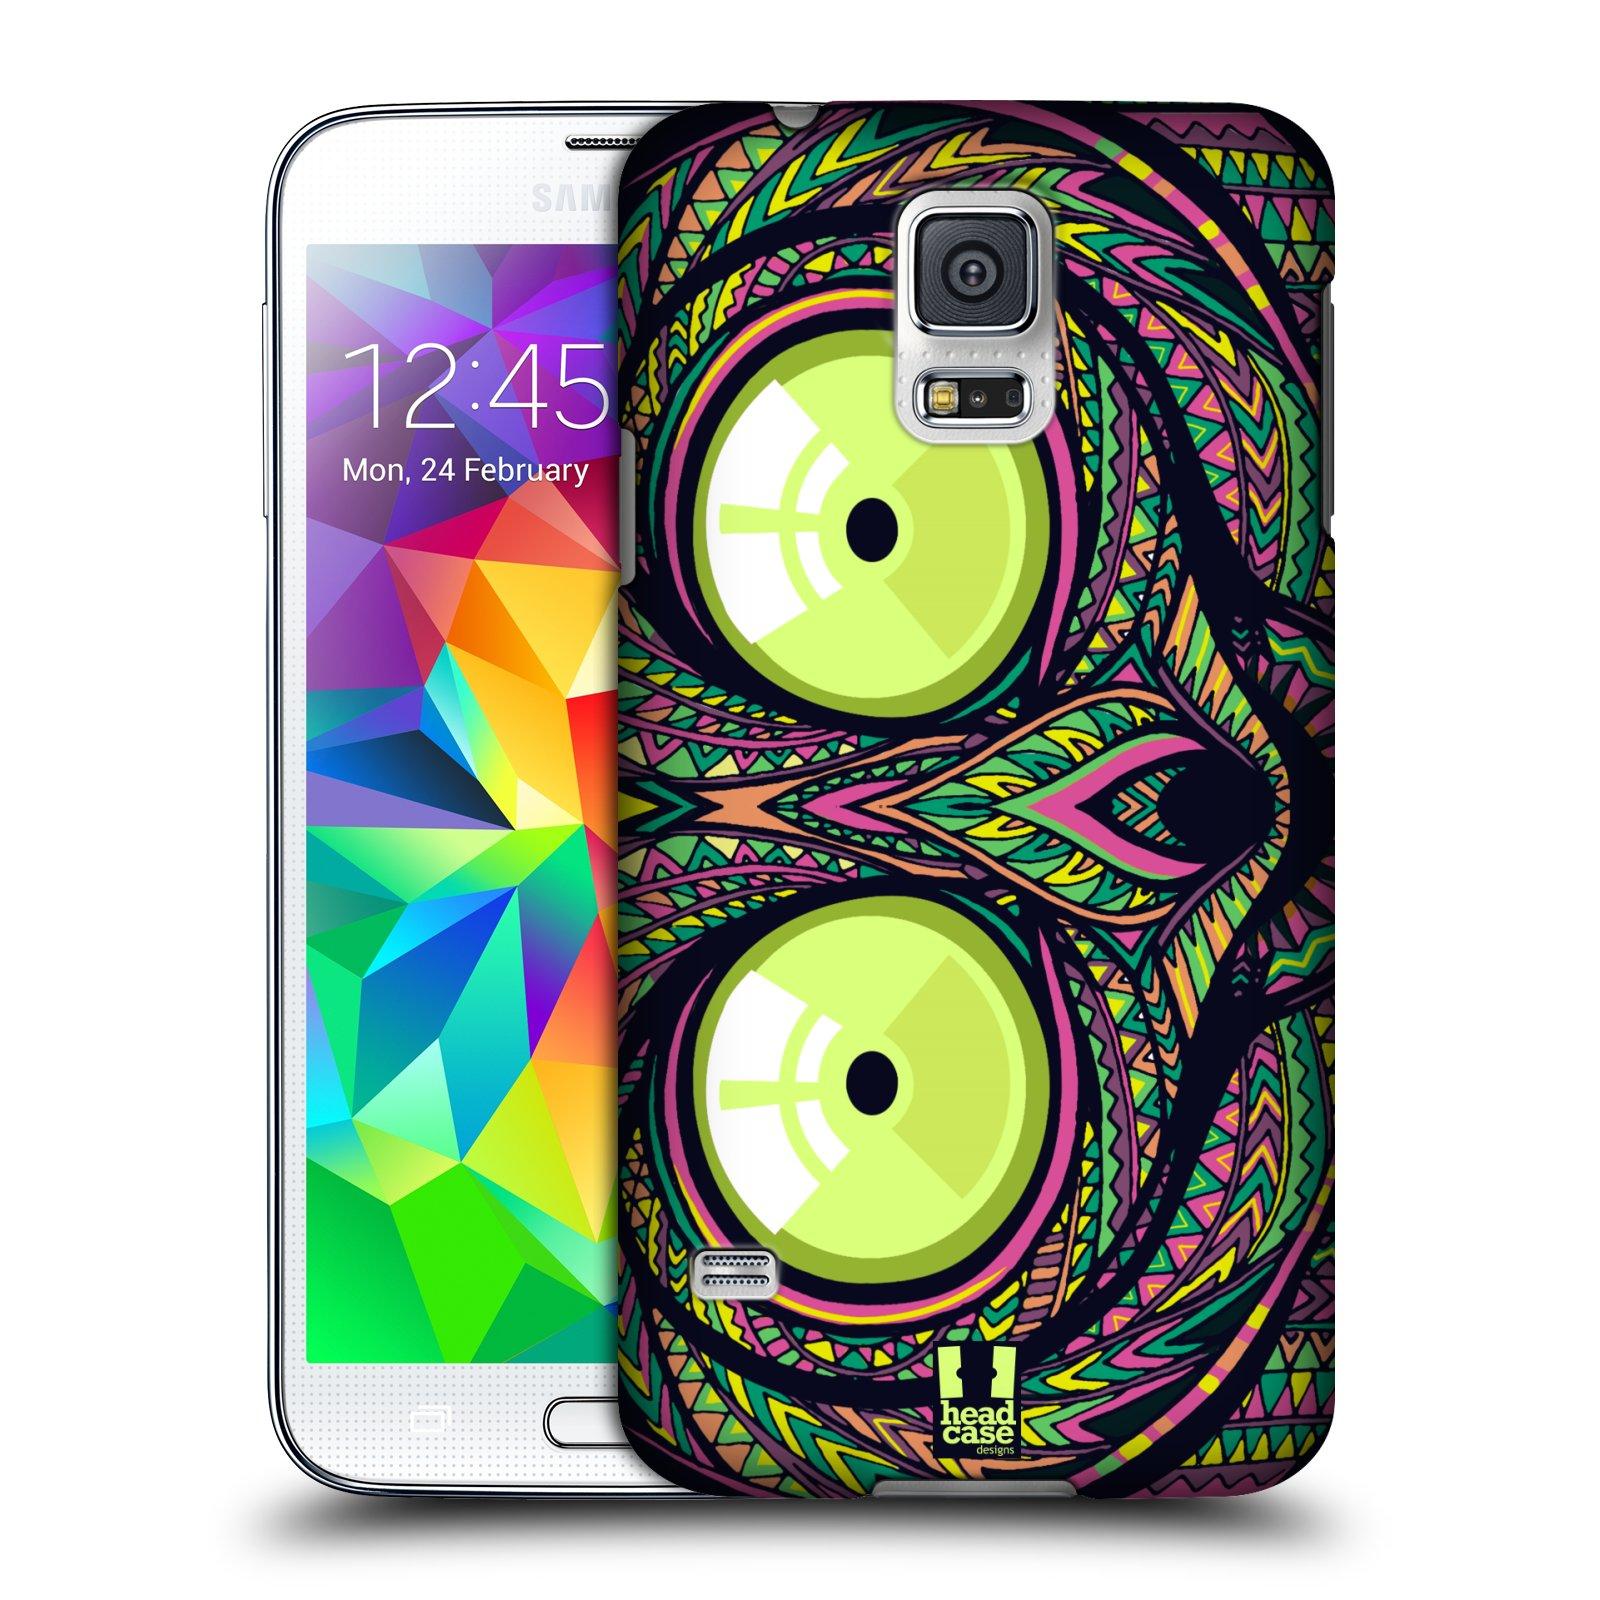 Plastové pouzdro na mobil Samsung Galaxy S5 HEAD CASE AZTEC NÁRTOUN